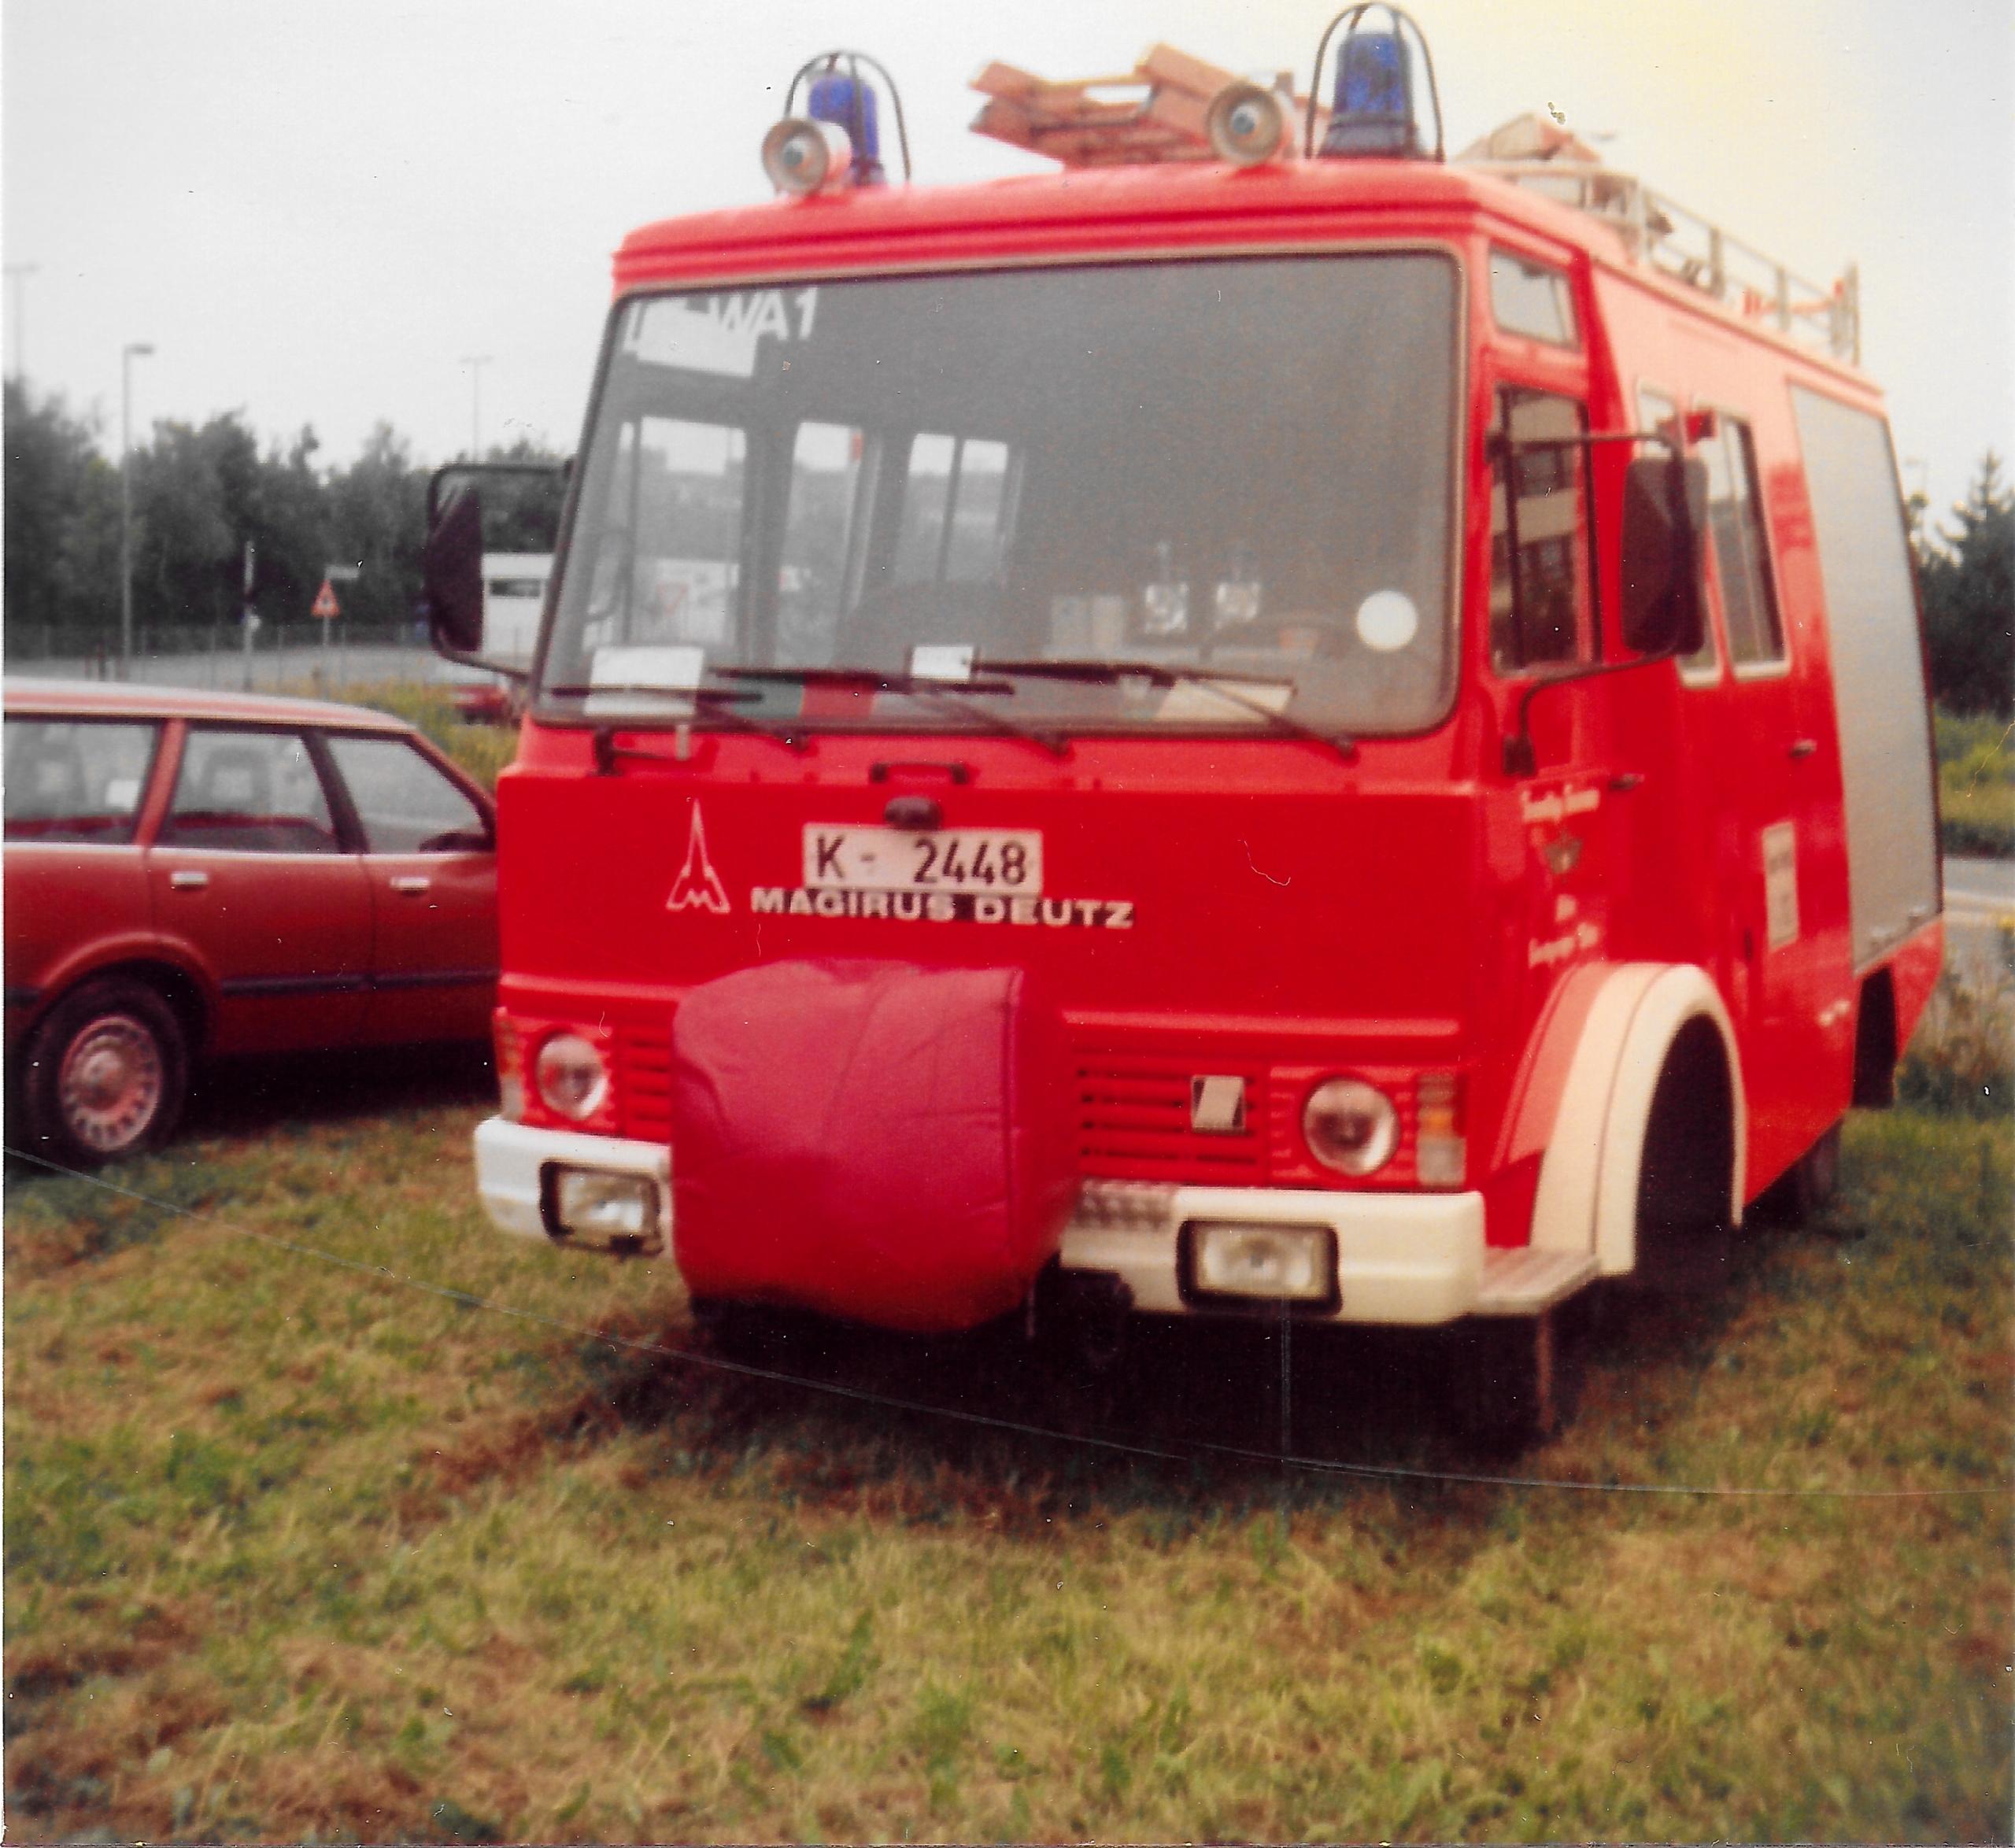 K-2448, LF PL JU, BJ 1981, Magirus